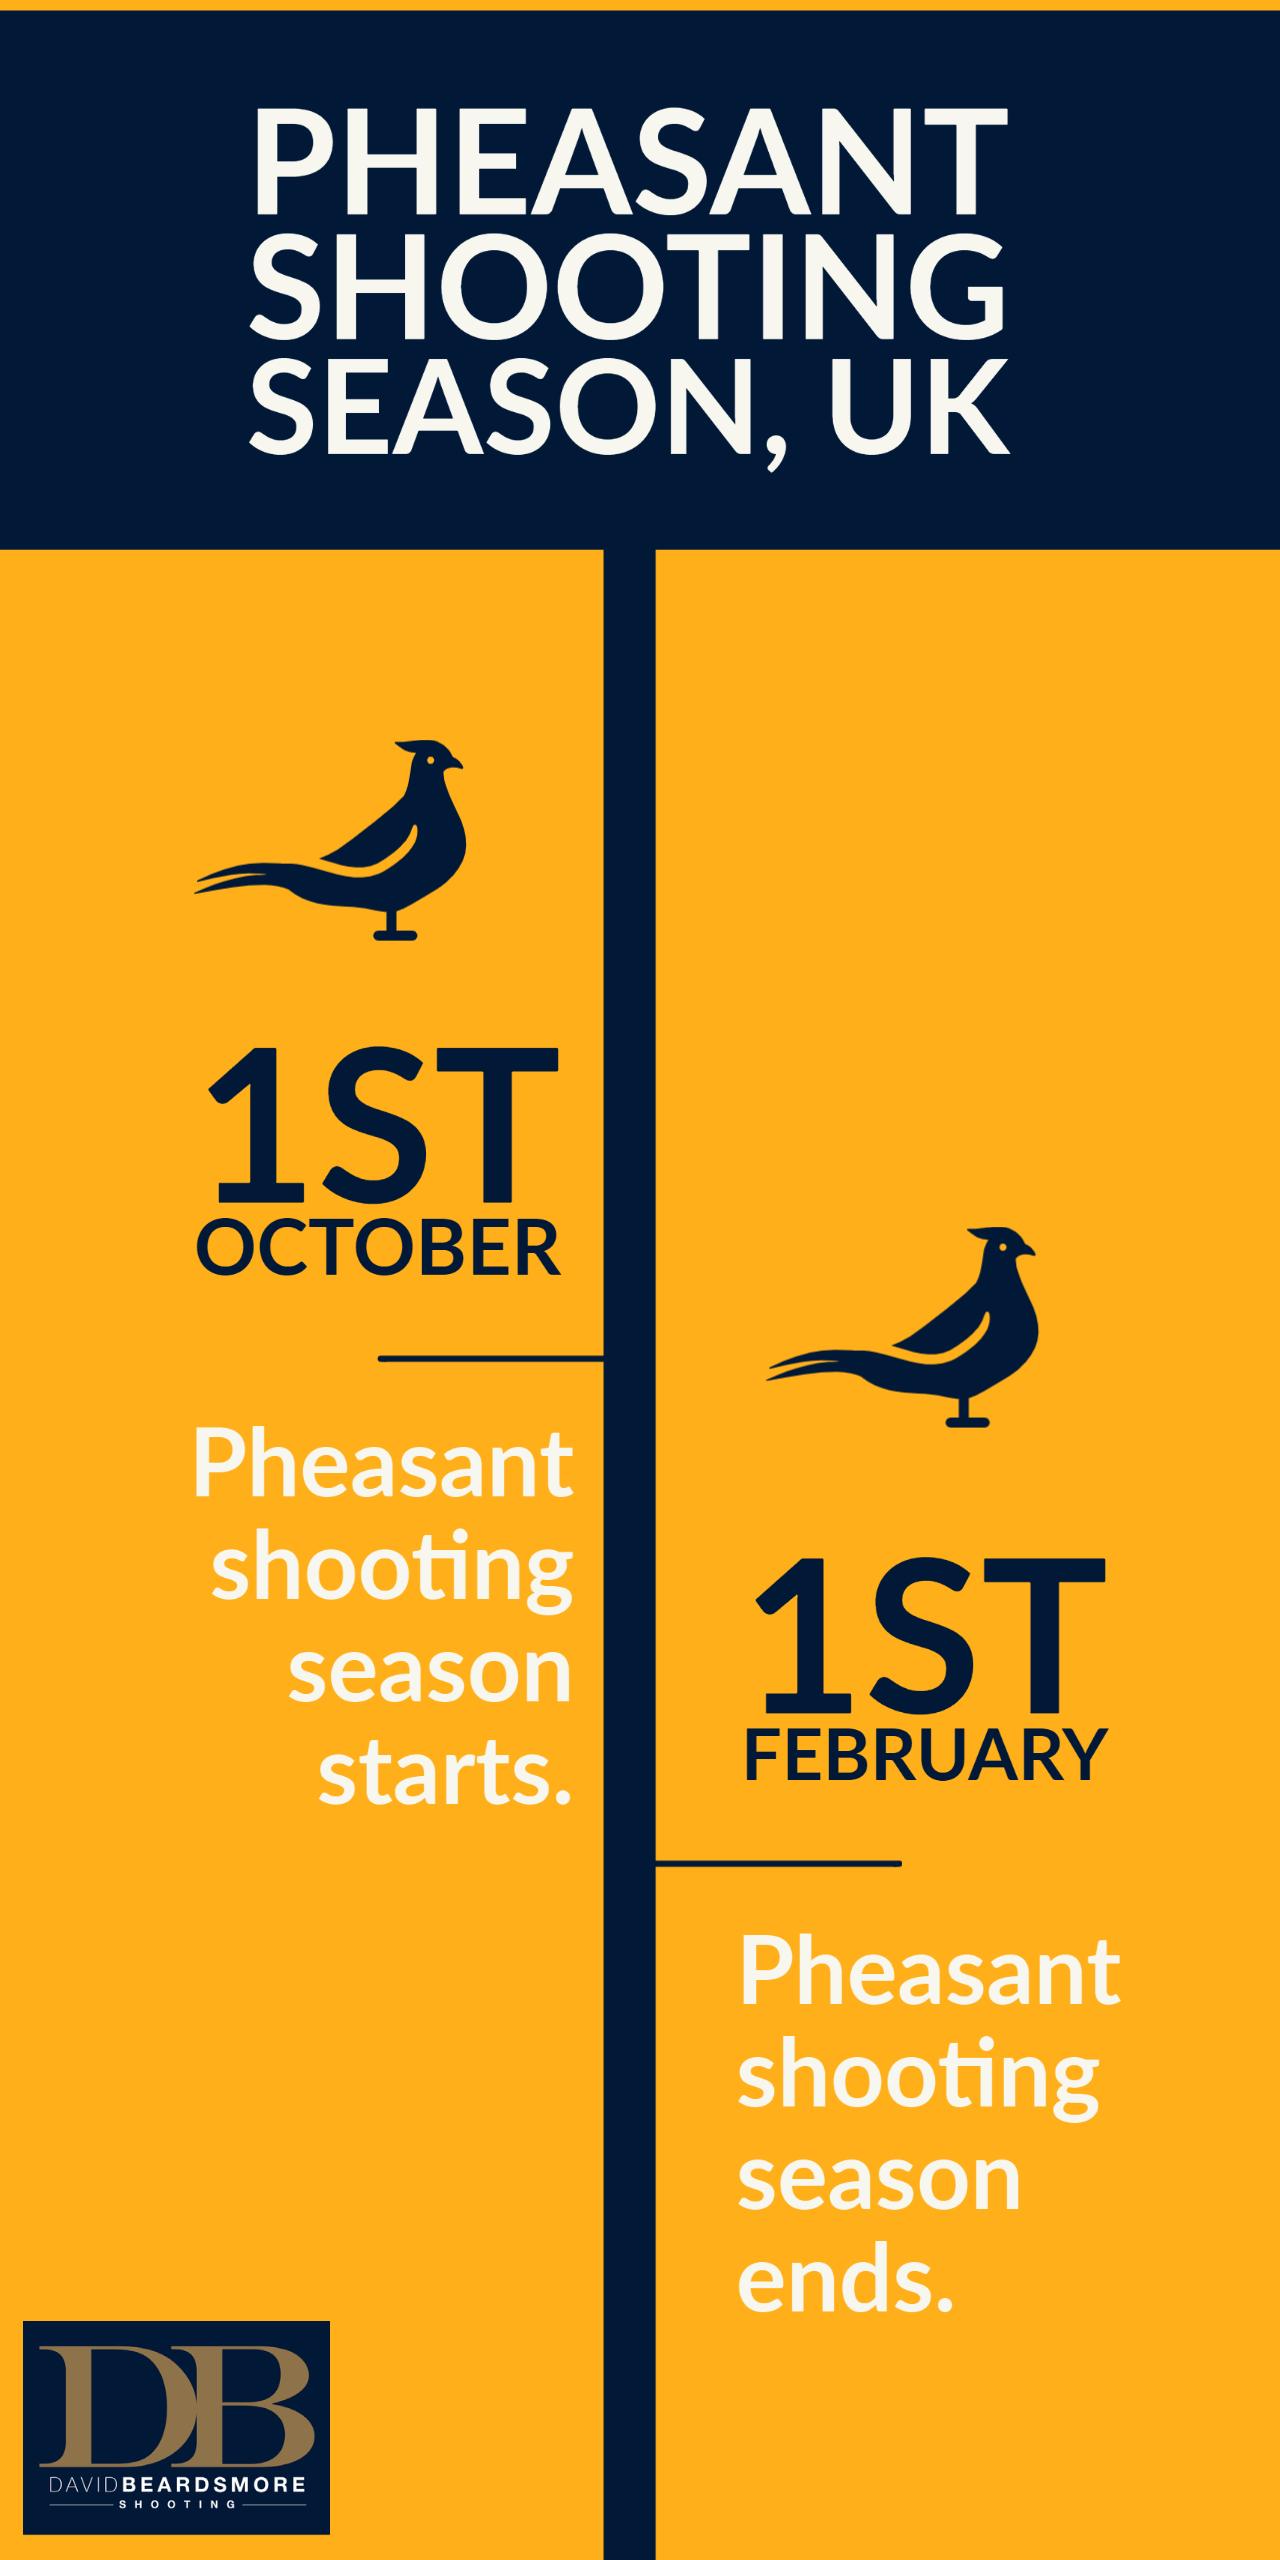 pheasant shooting season starts and ends